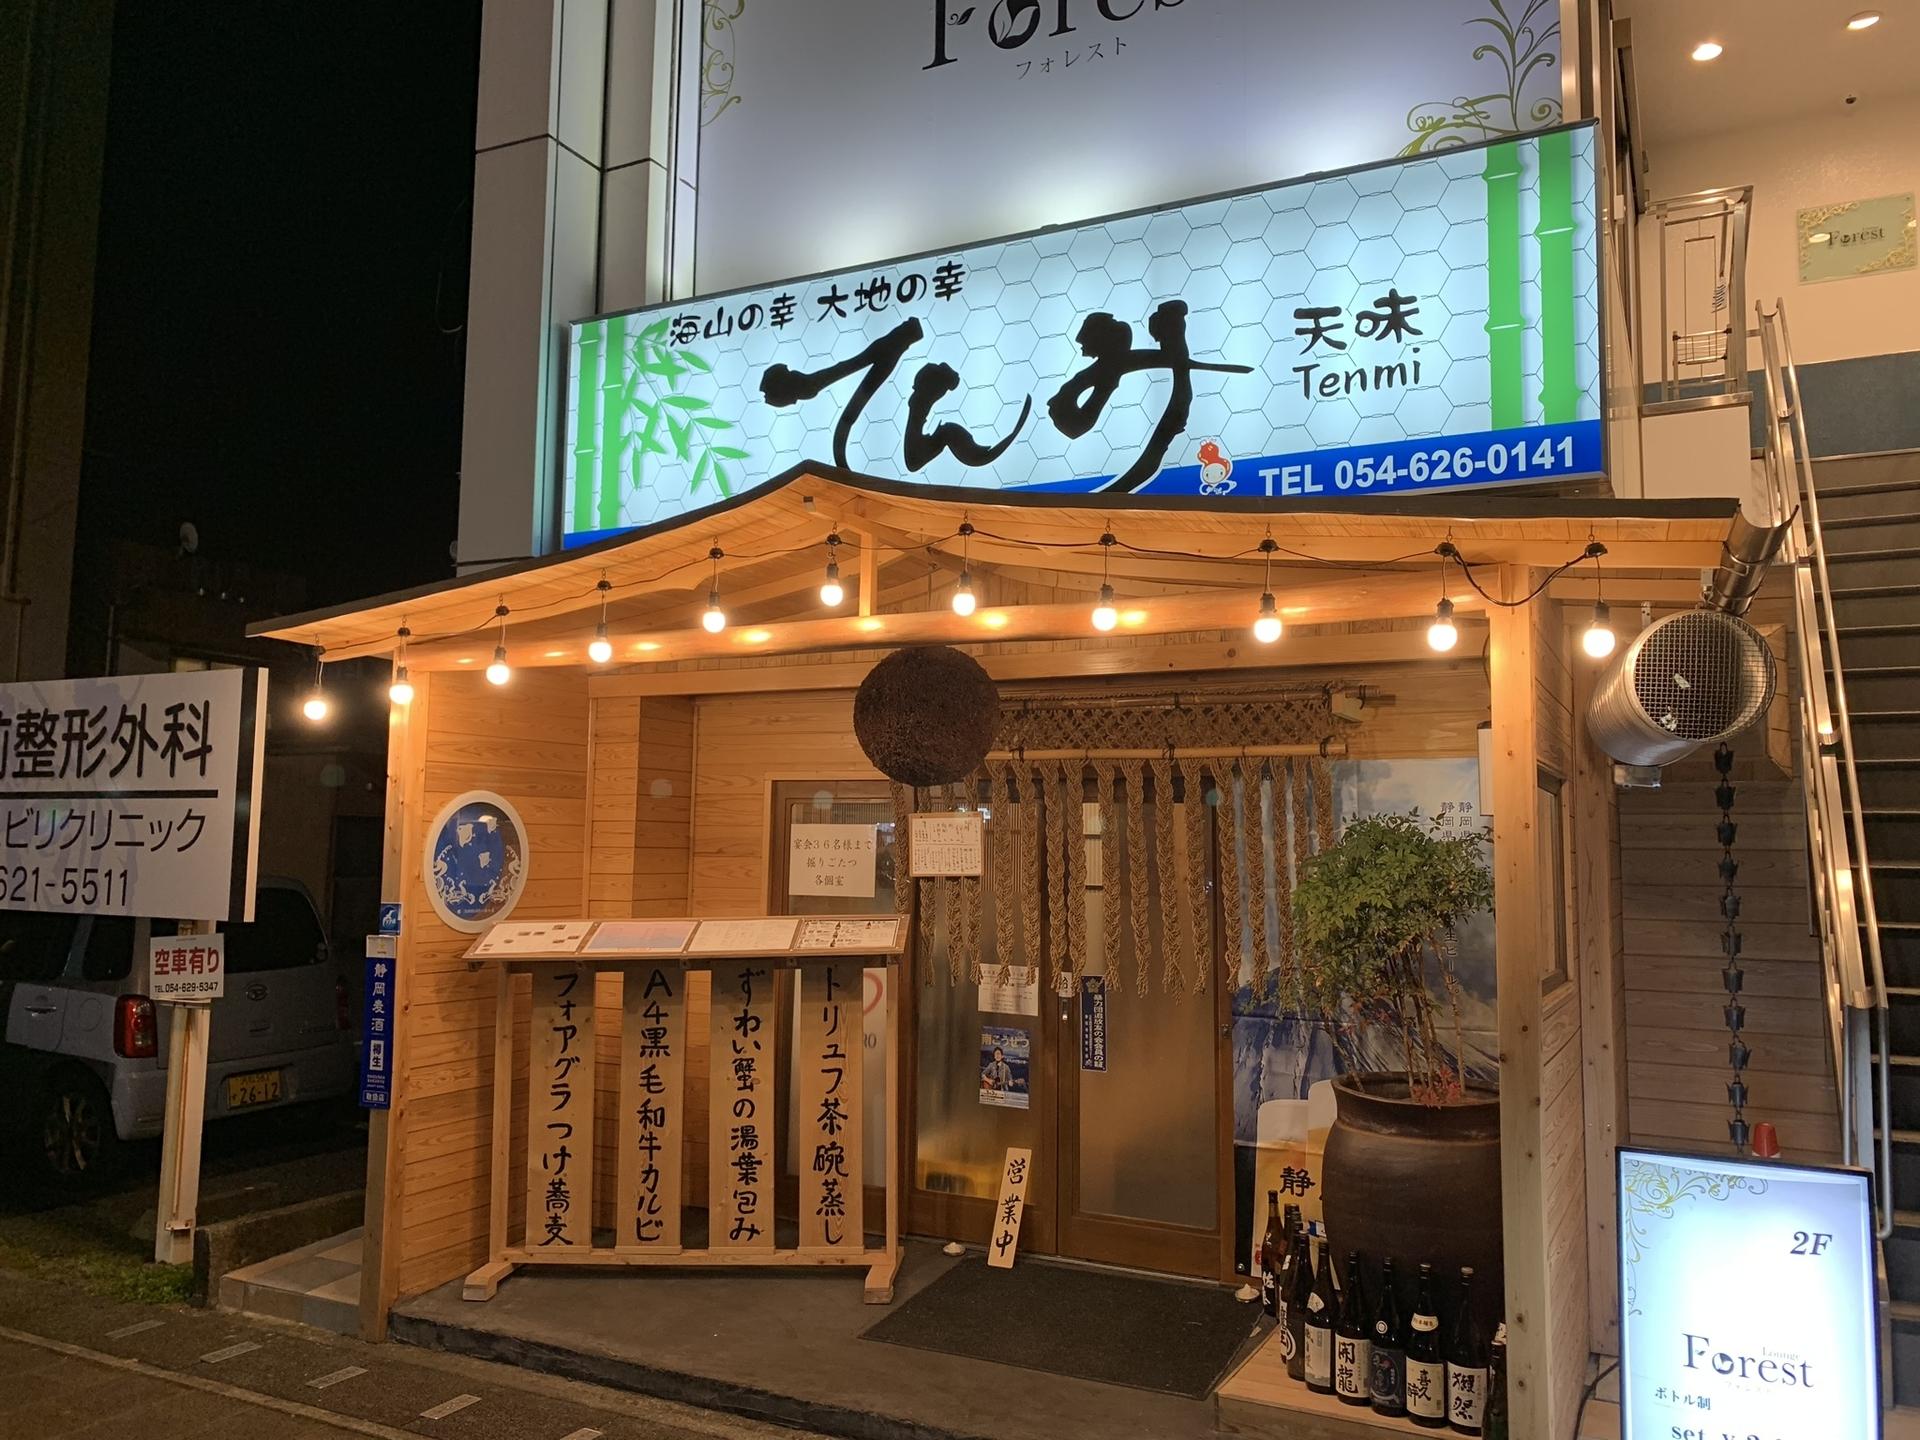 f:id:tetsuya0723:20190103191339j:plain